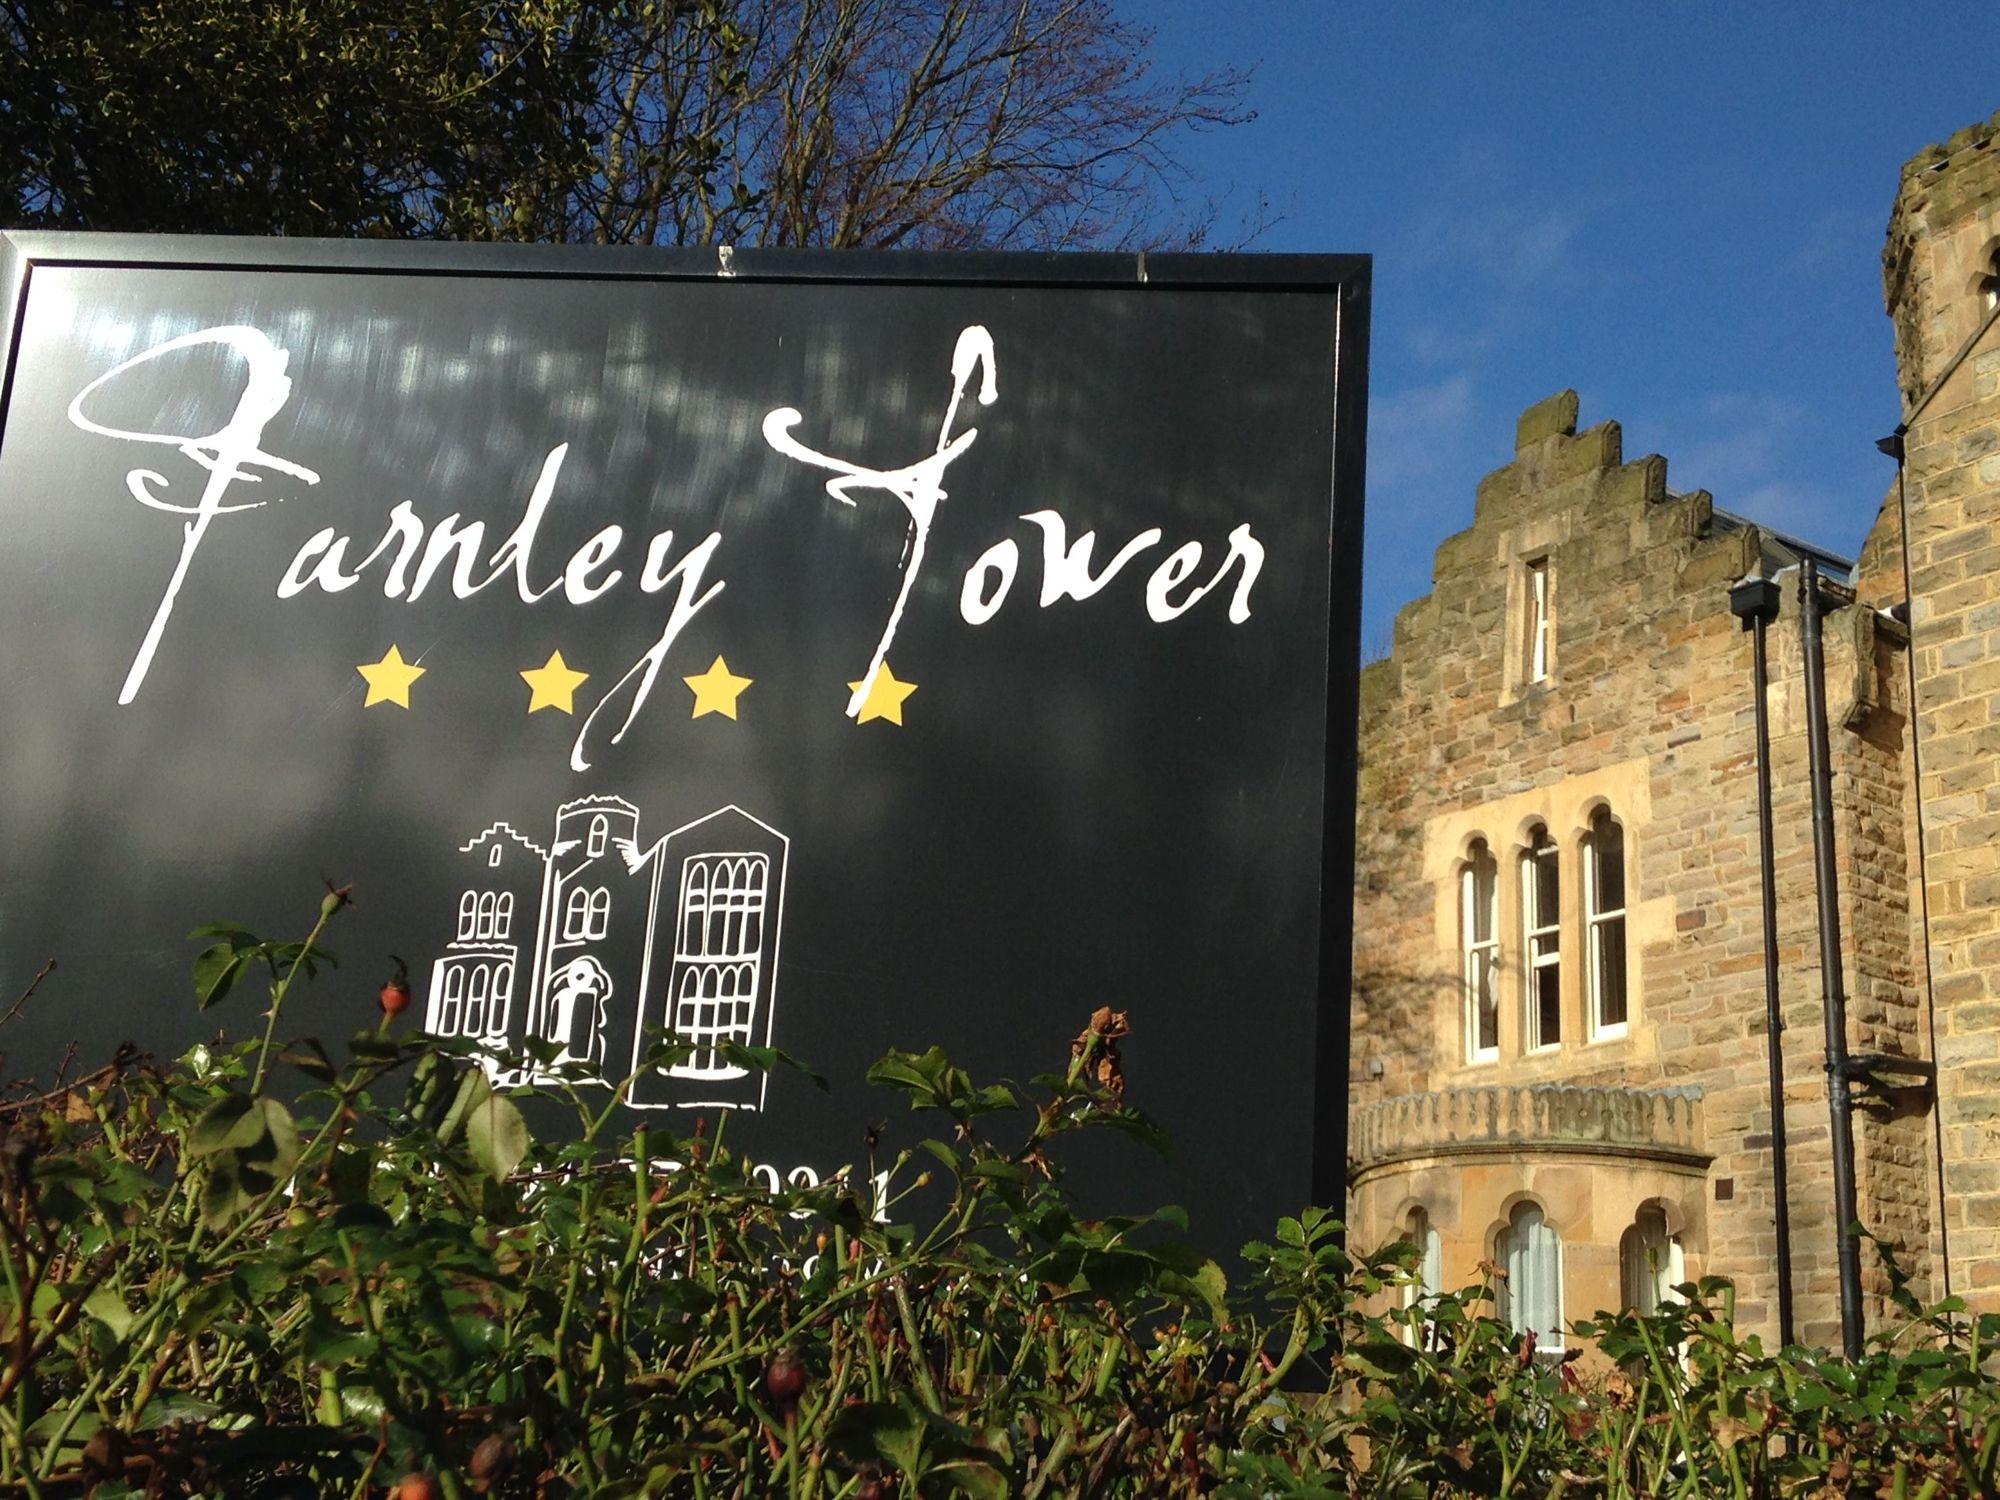 Farnley Tower